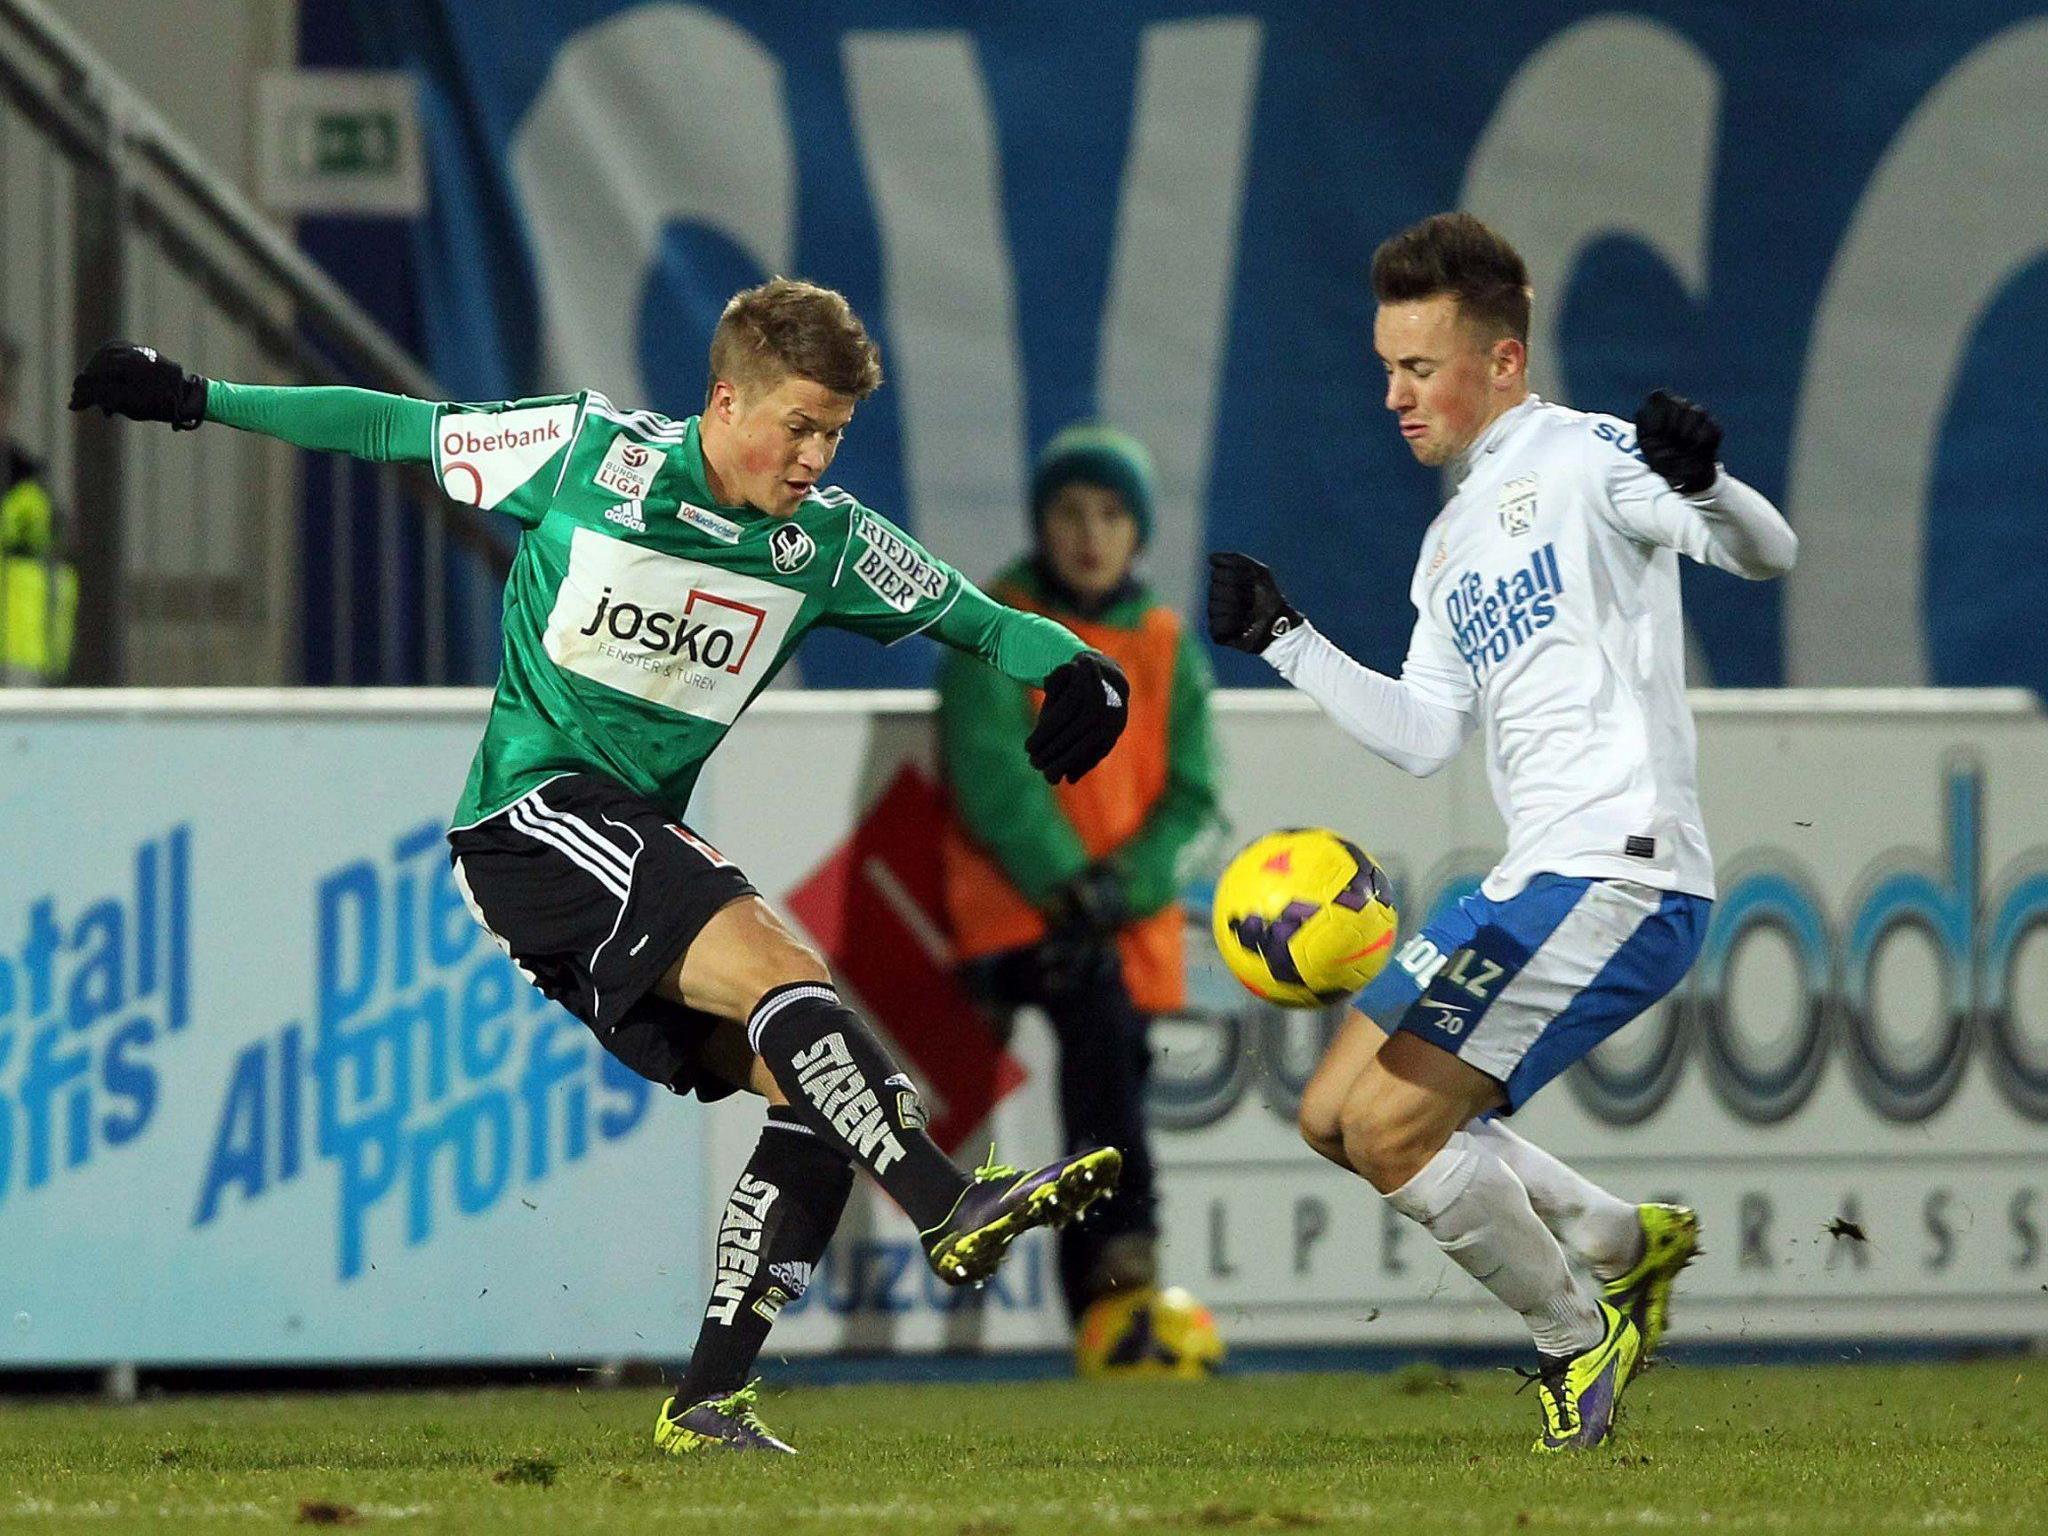 LIVE-Ticker vom Spiel SV Ried gegen SV Grödig ab 19 Uhr.